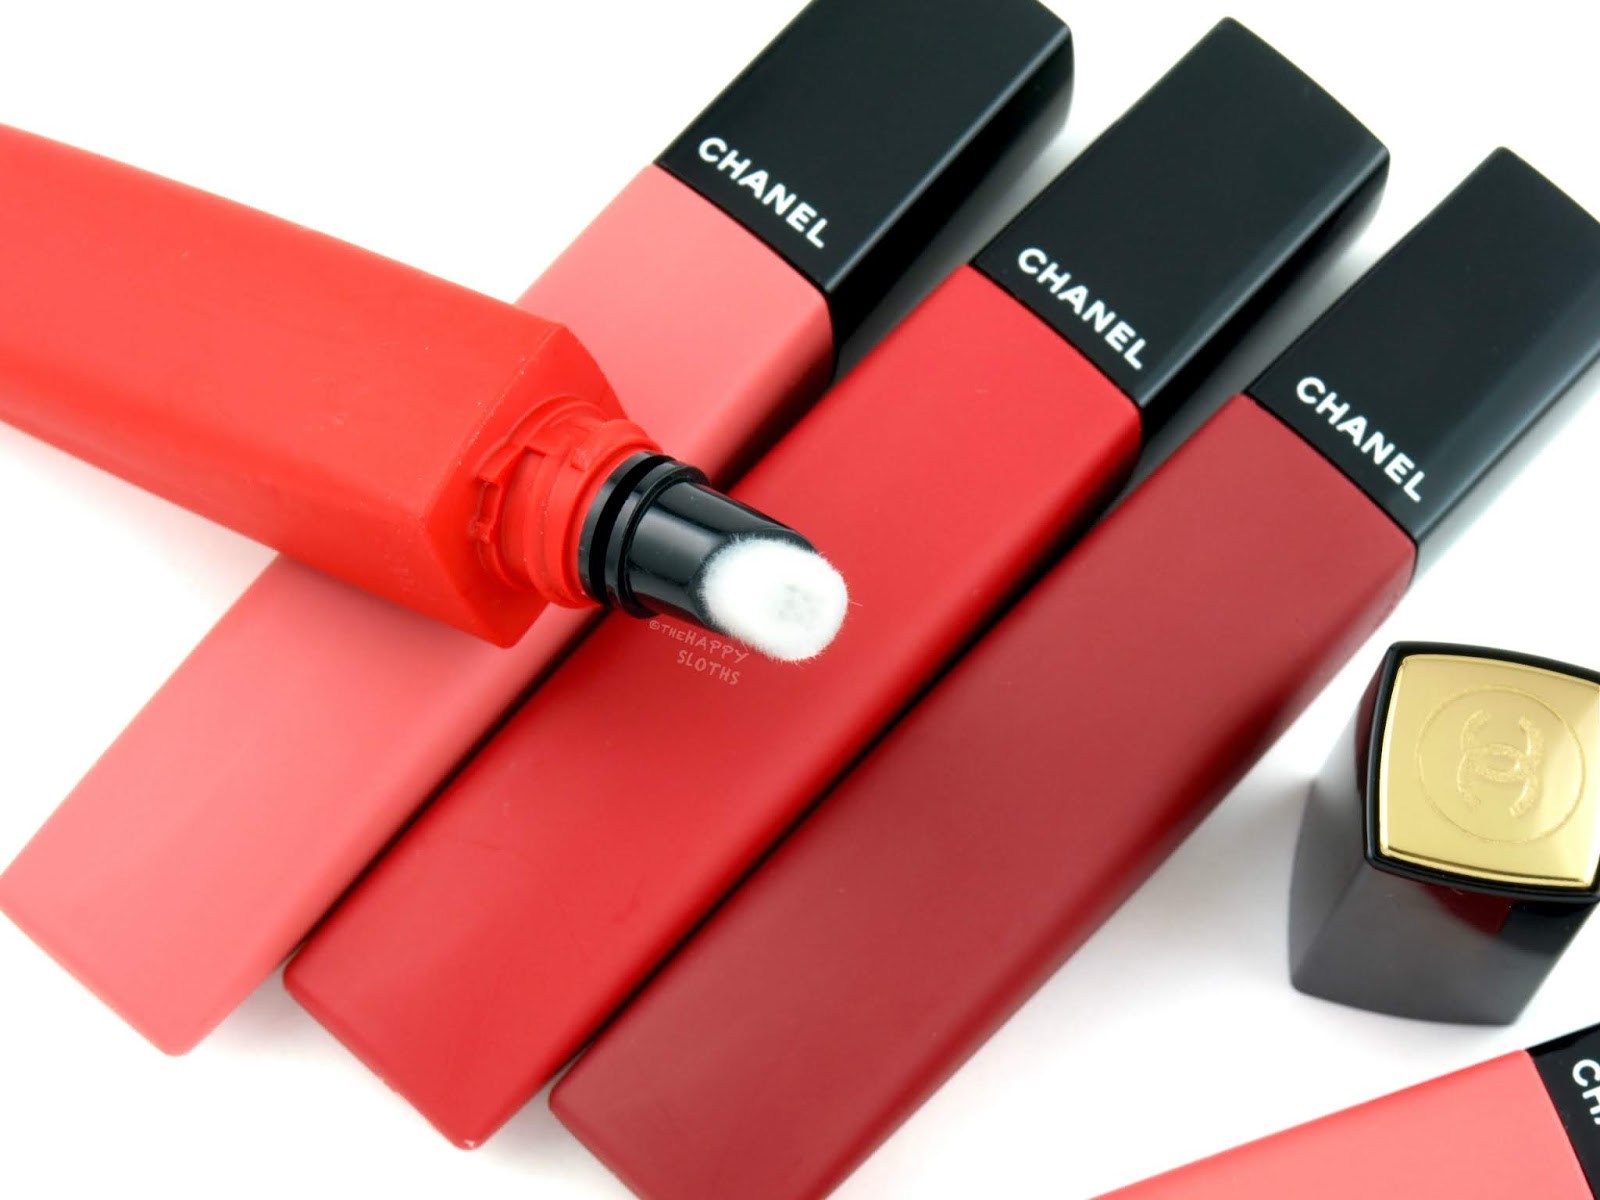 Kết quả hình ảnh cho Chanel Rouge Allure Liquid Powder